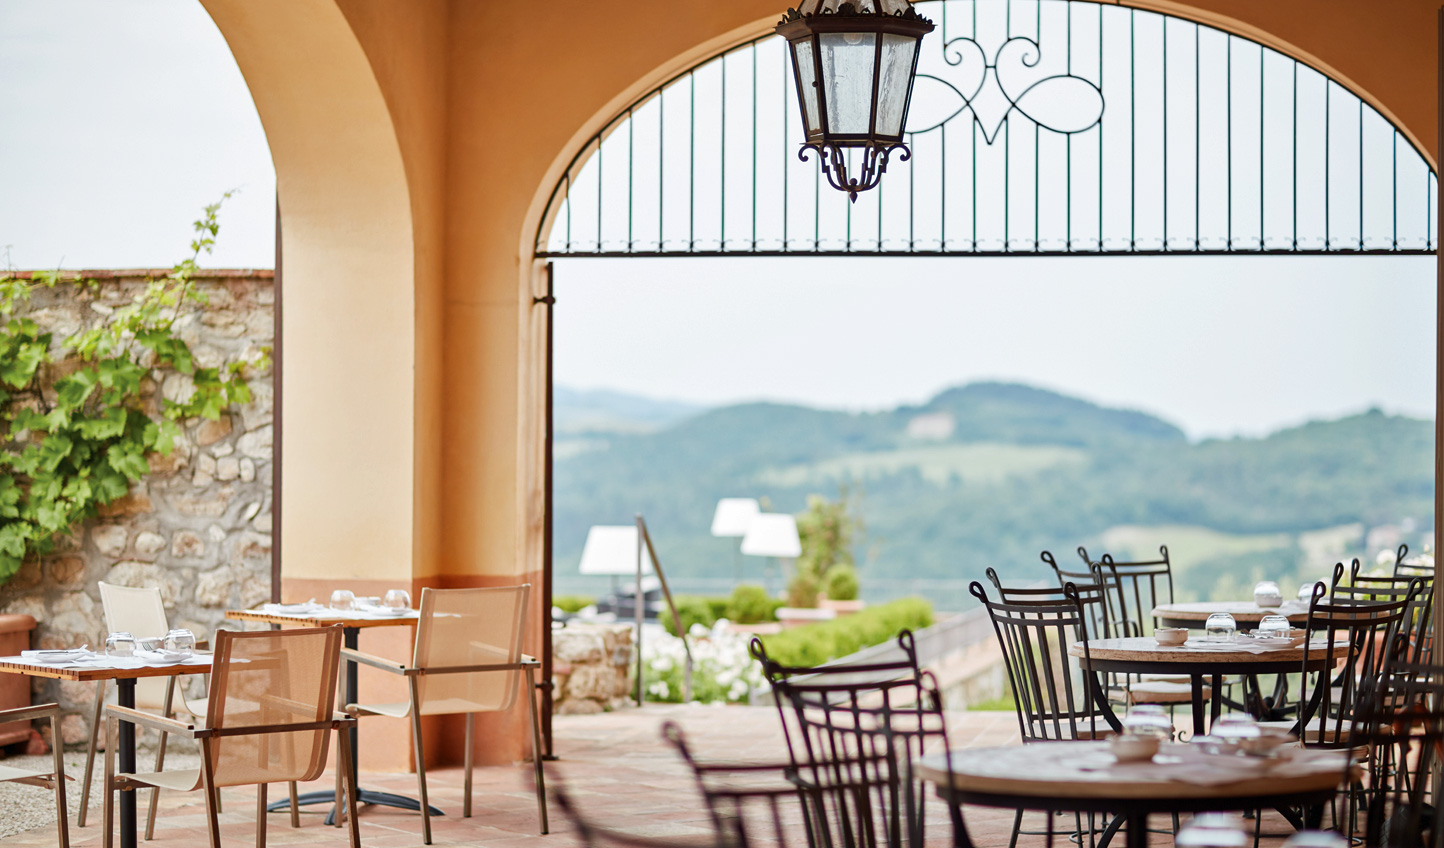 An aperitivo with a view at Bar Visconti